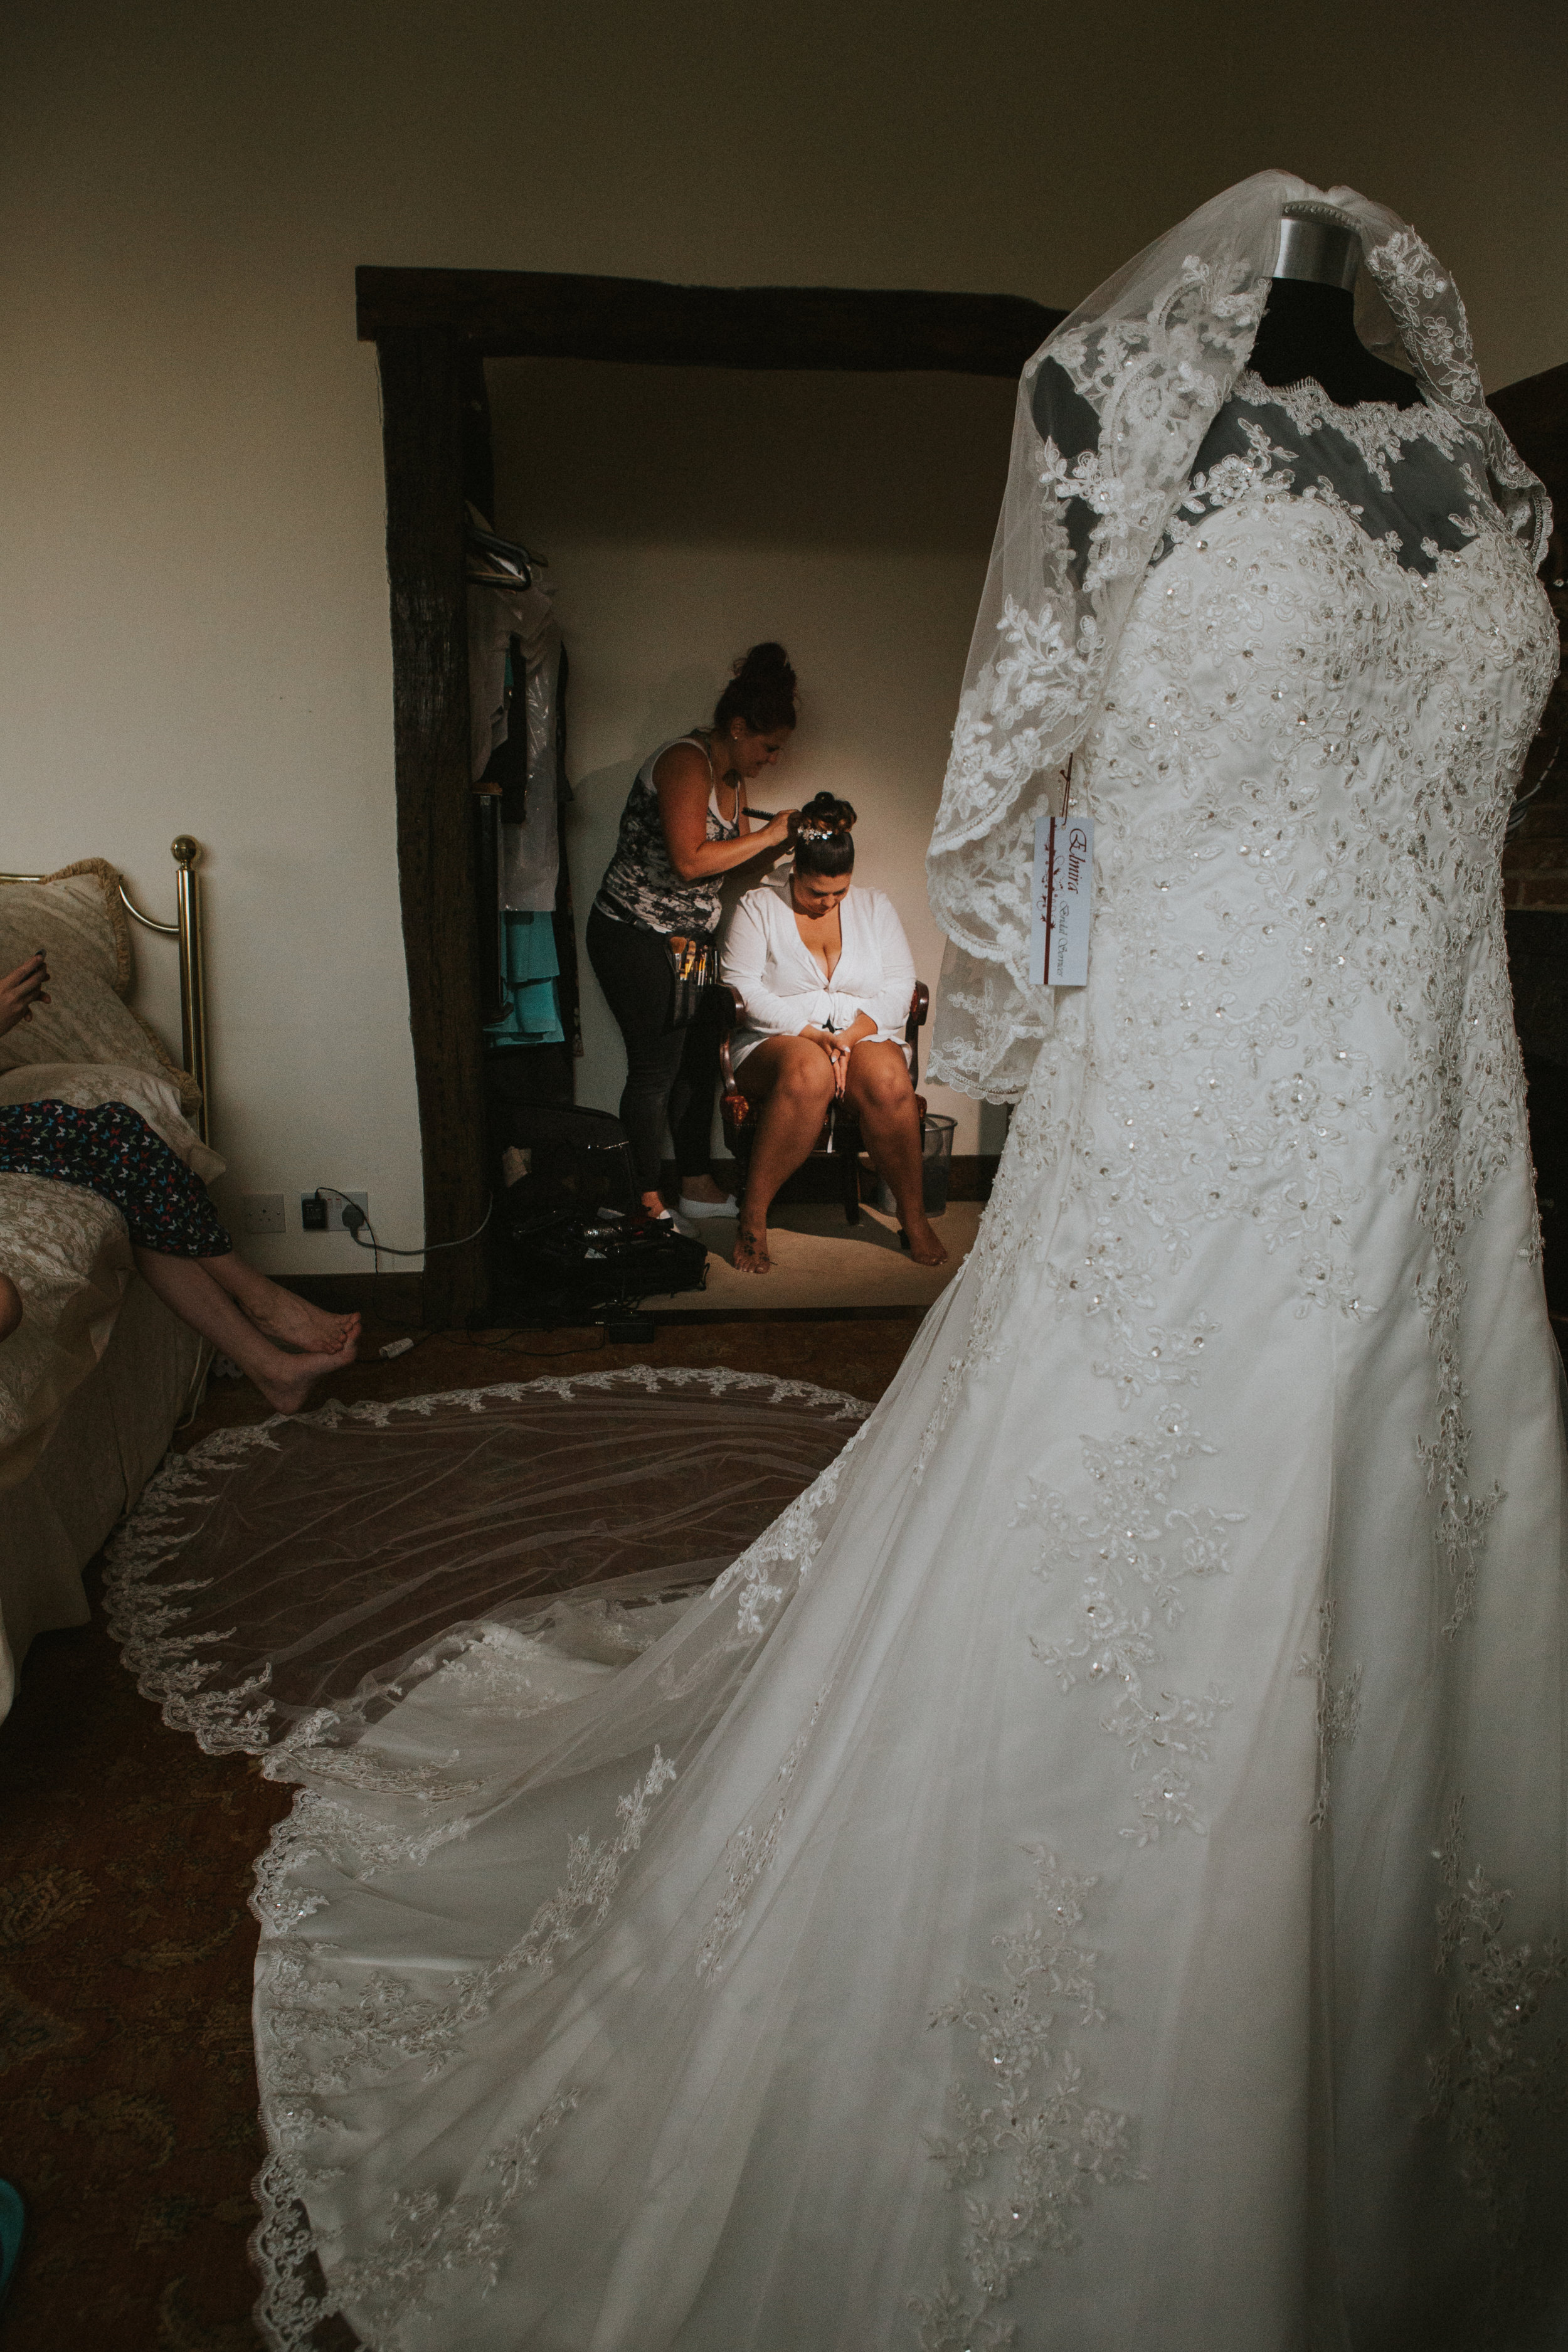 westenhangar-castle-kent-london-wedding-photography-bridal-prep-dress-15